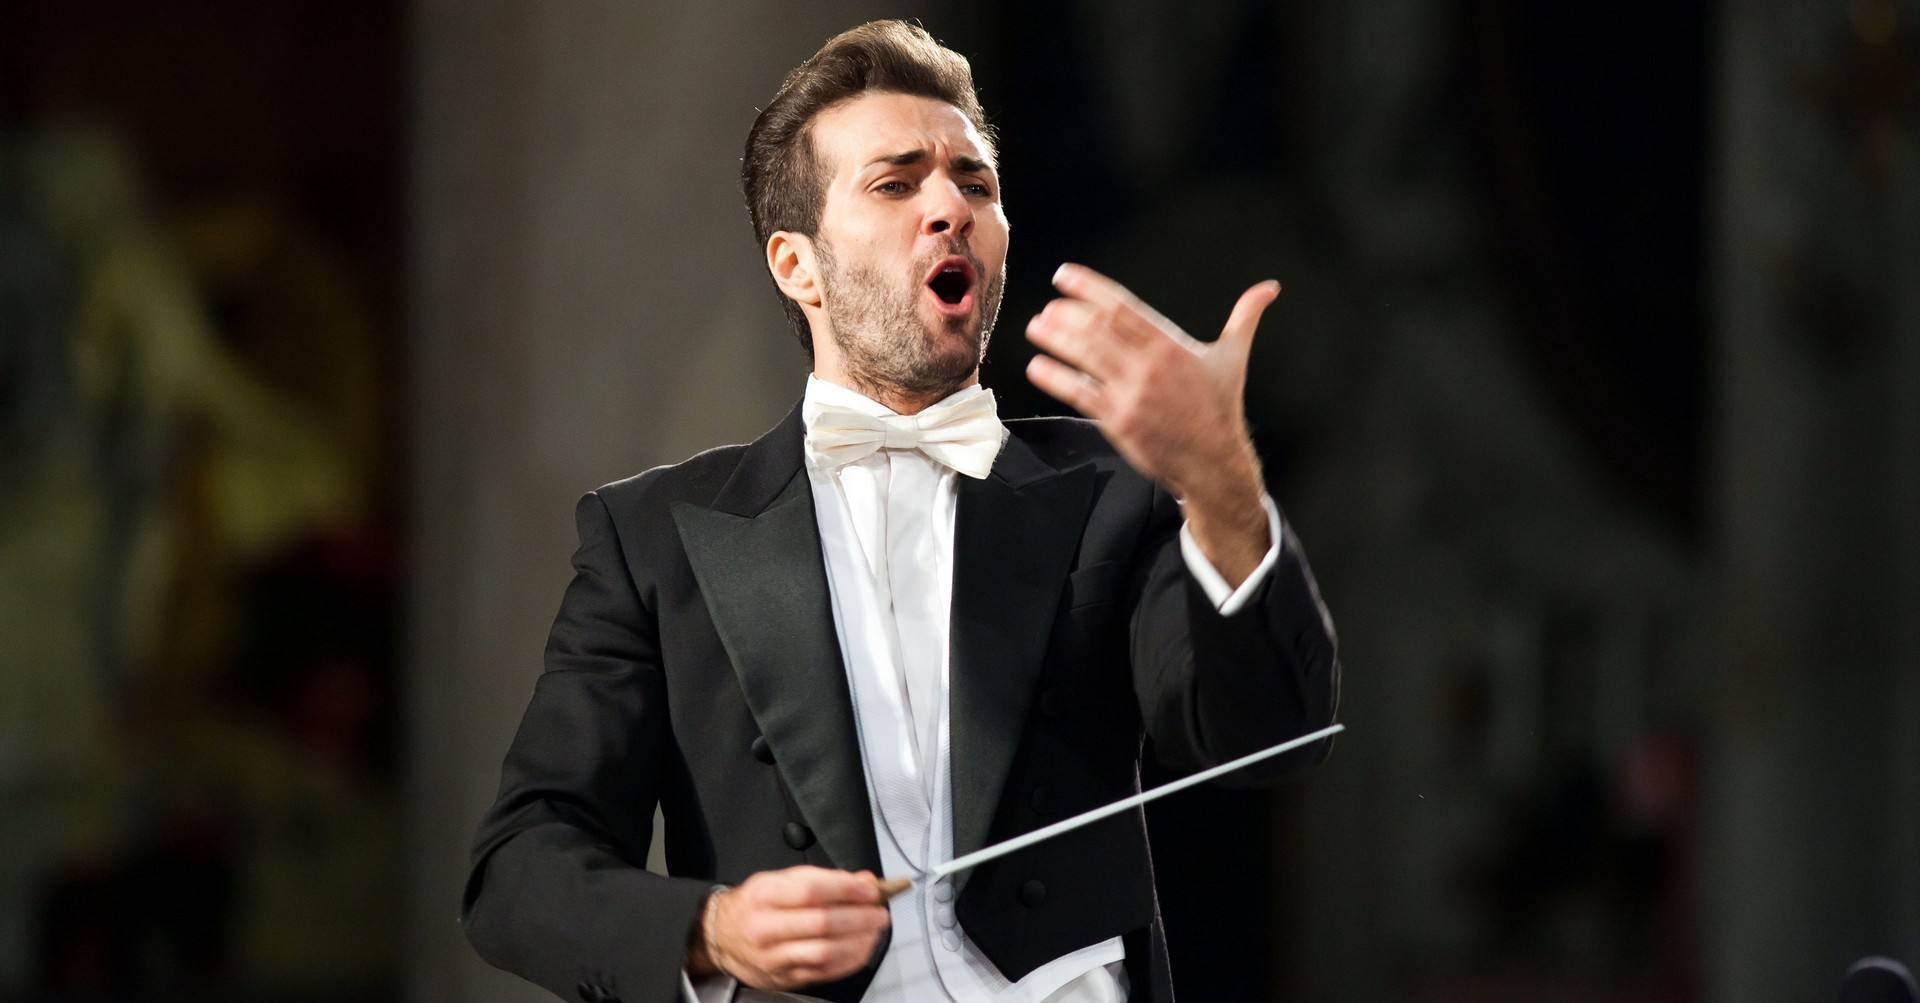 Jacopo Sipari